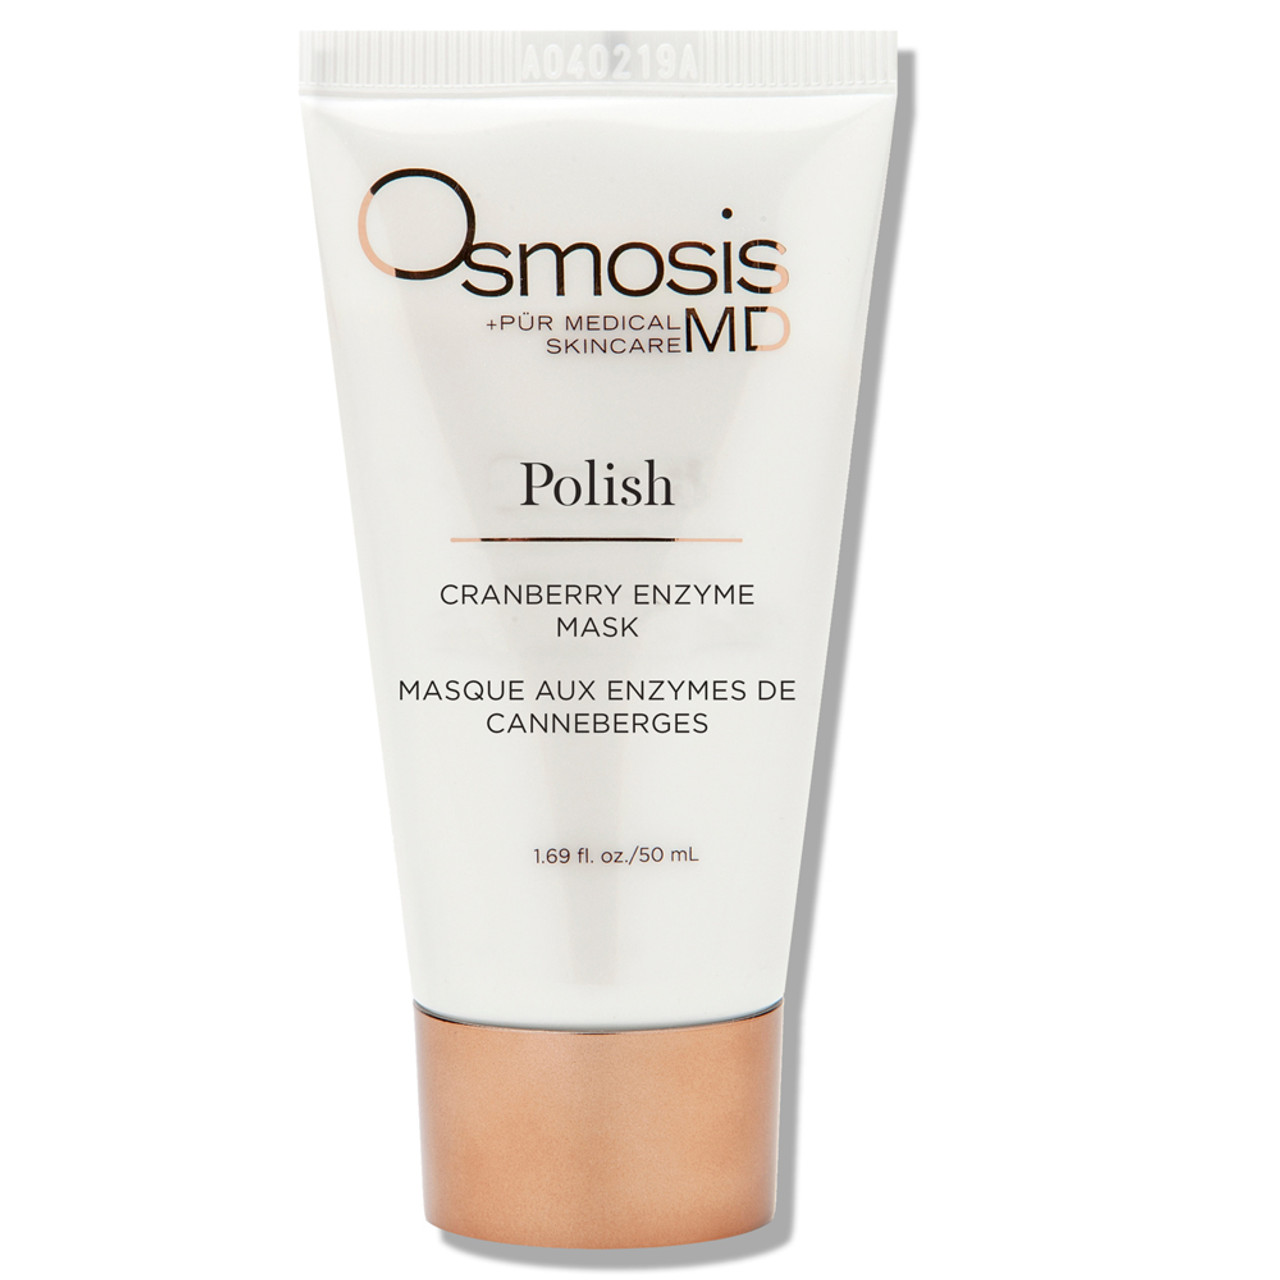 Osmosis +Skincare MD Polish - Cranberry Enzyme Mask